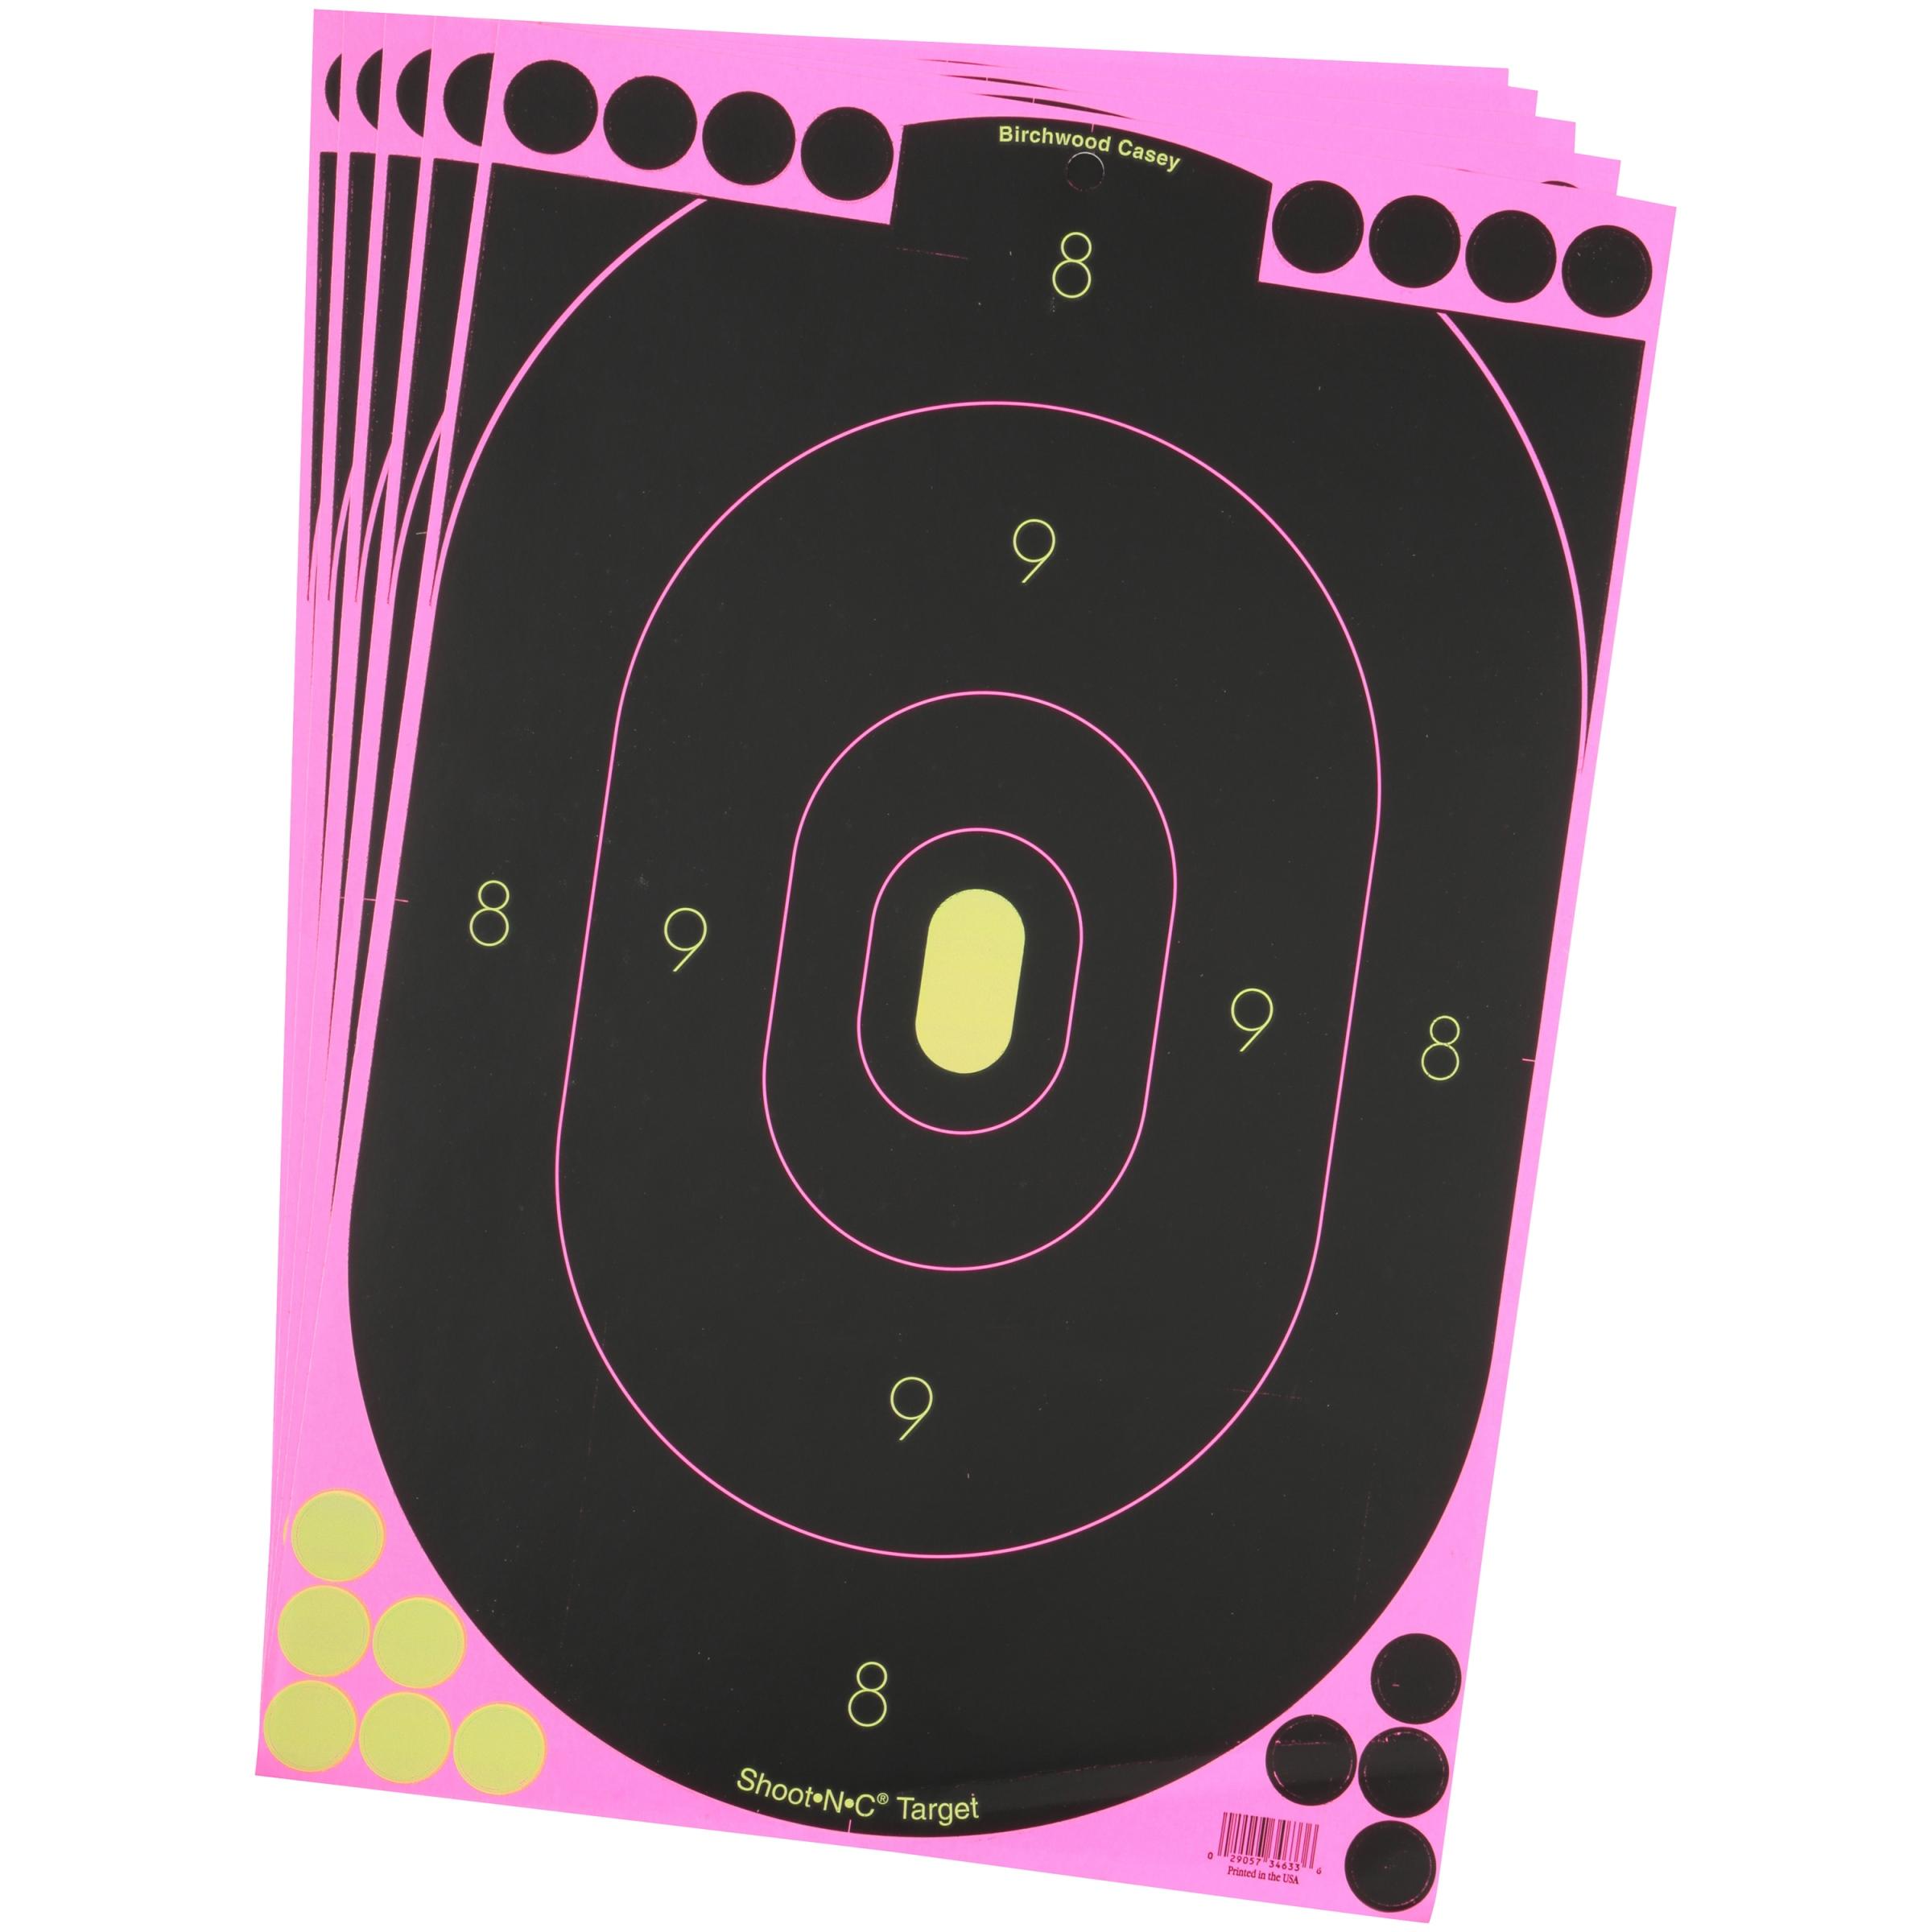 "Shoot•N•C® 12"" x 18"" Oval Pink Silhouette Target - 5 targets"